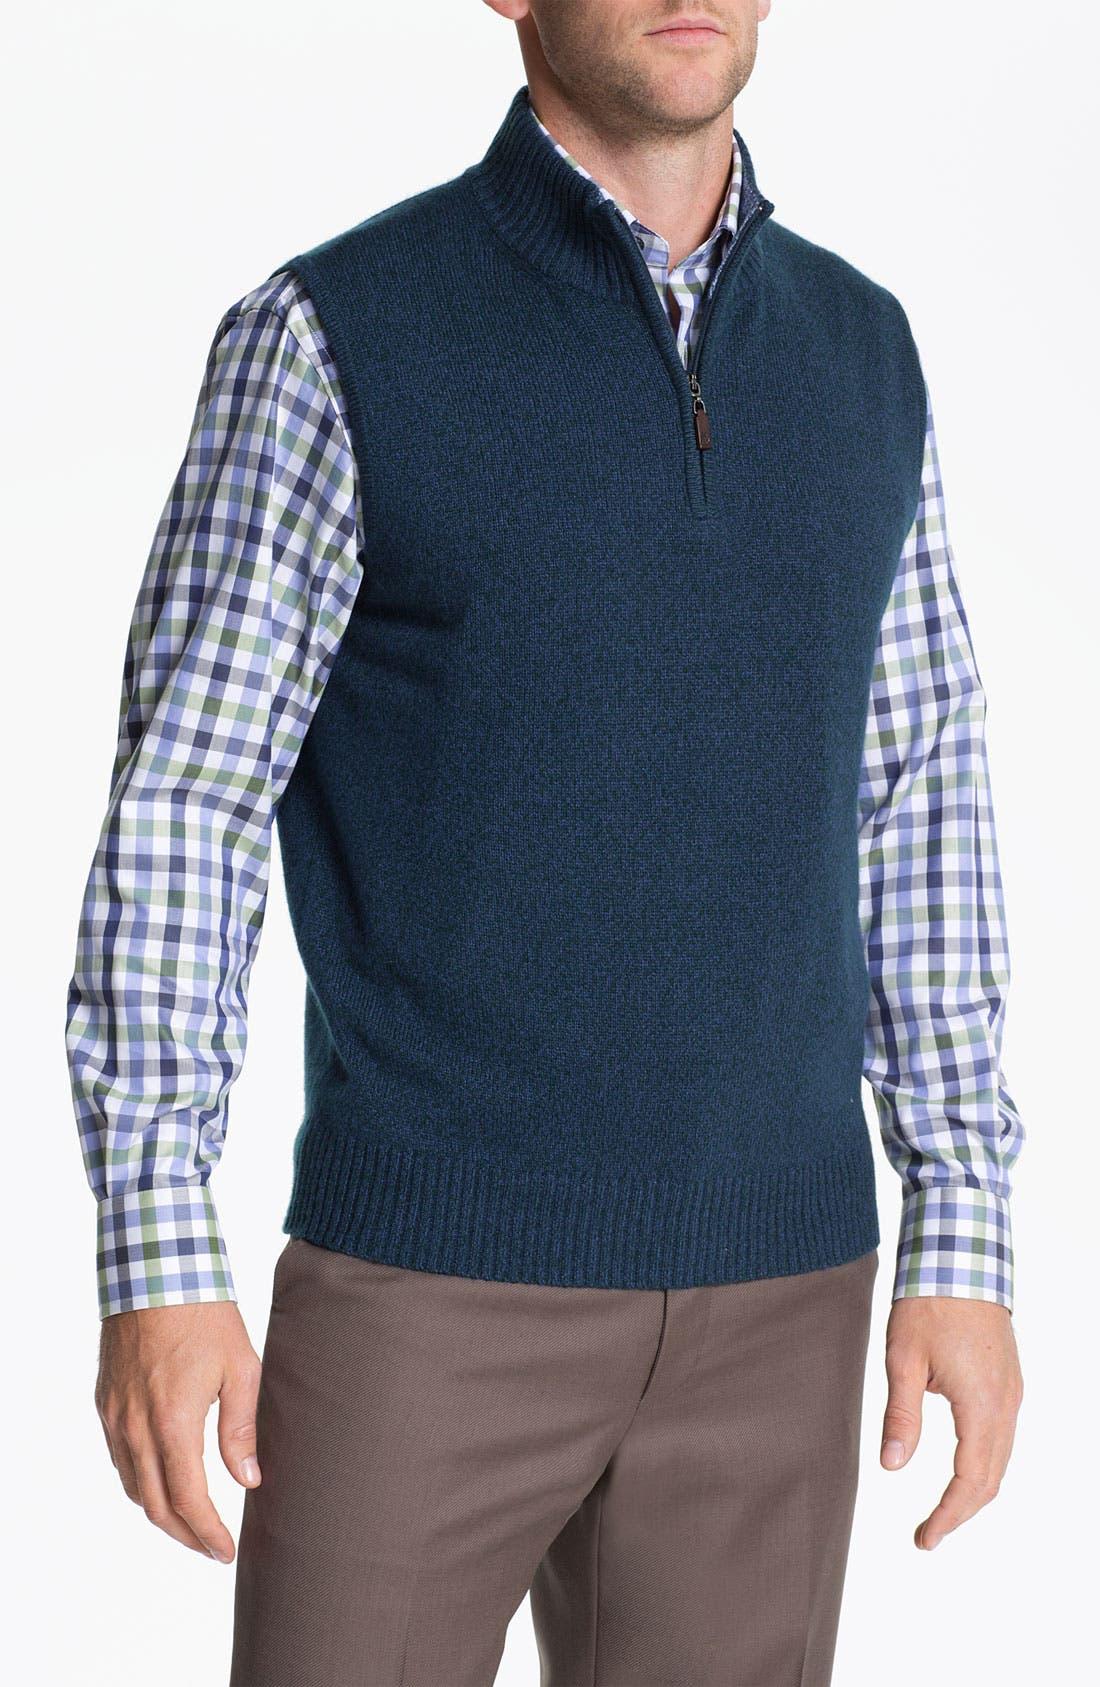 Alternate Image 1 Selected - Robert Talbott Wool & Cashmere Blend Sweater Vest